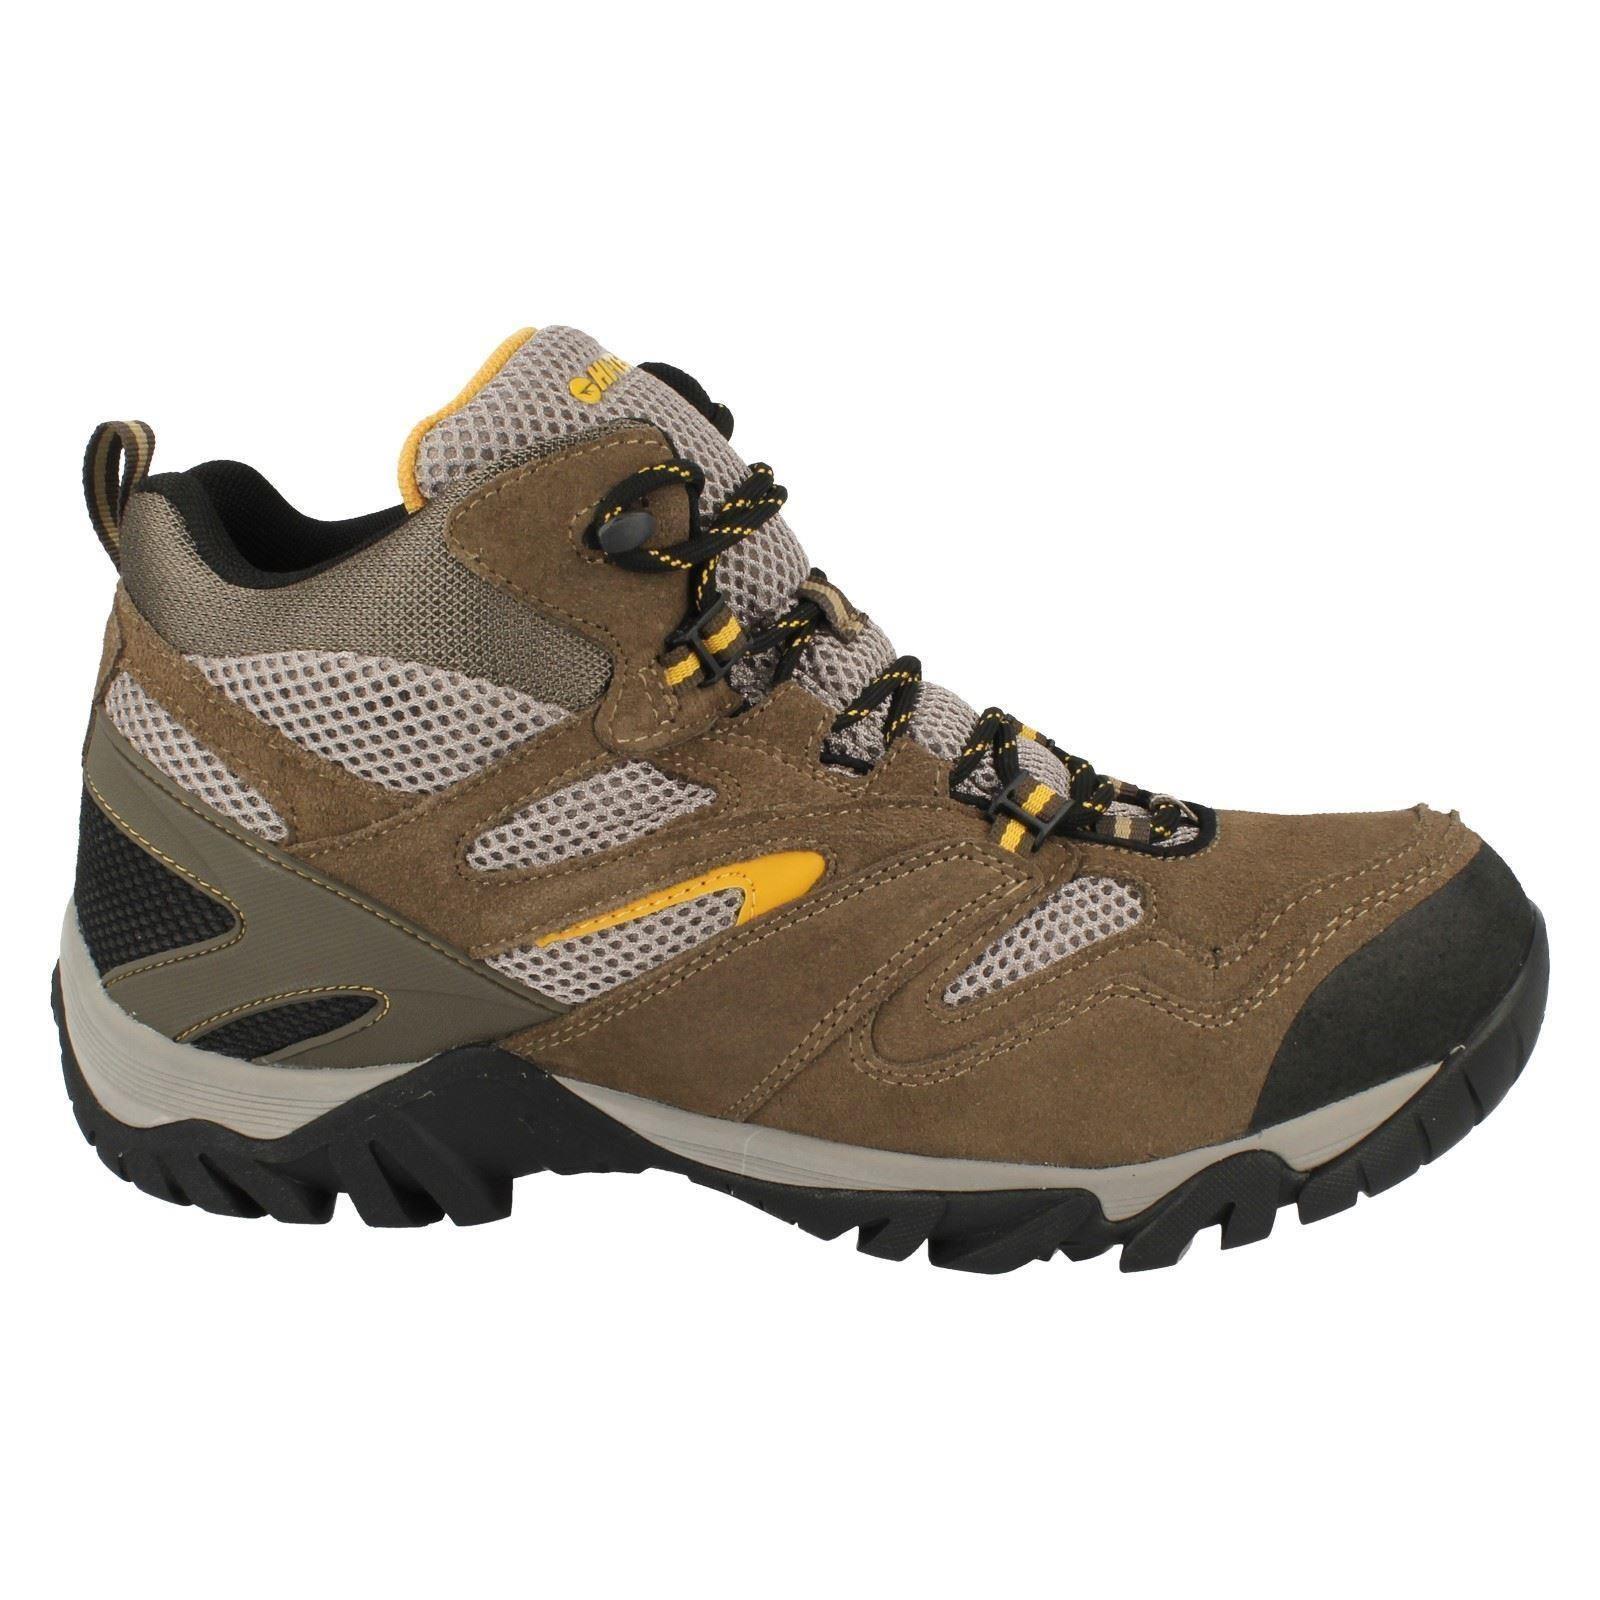 mens hi tec waterproof walking hiking boots coyote mid